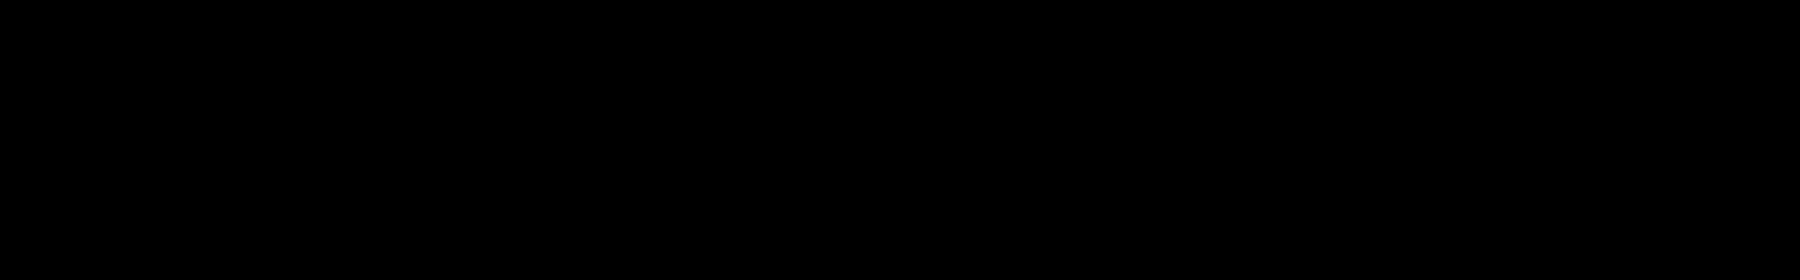 Sam Laxton - Pure Trance audio waveform